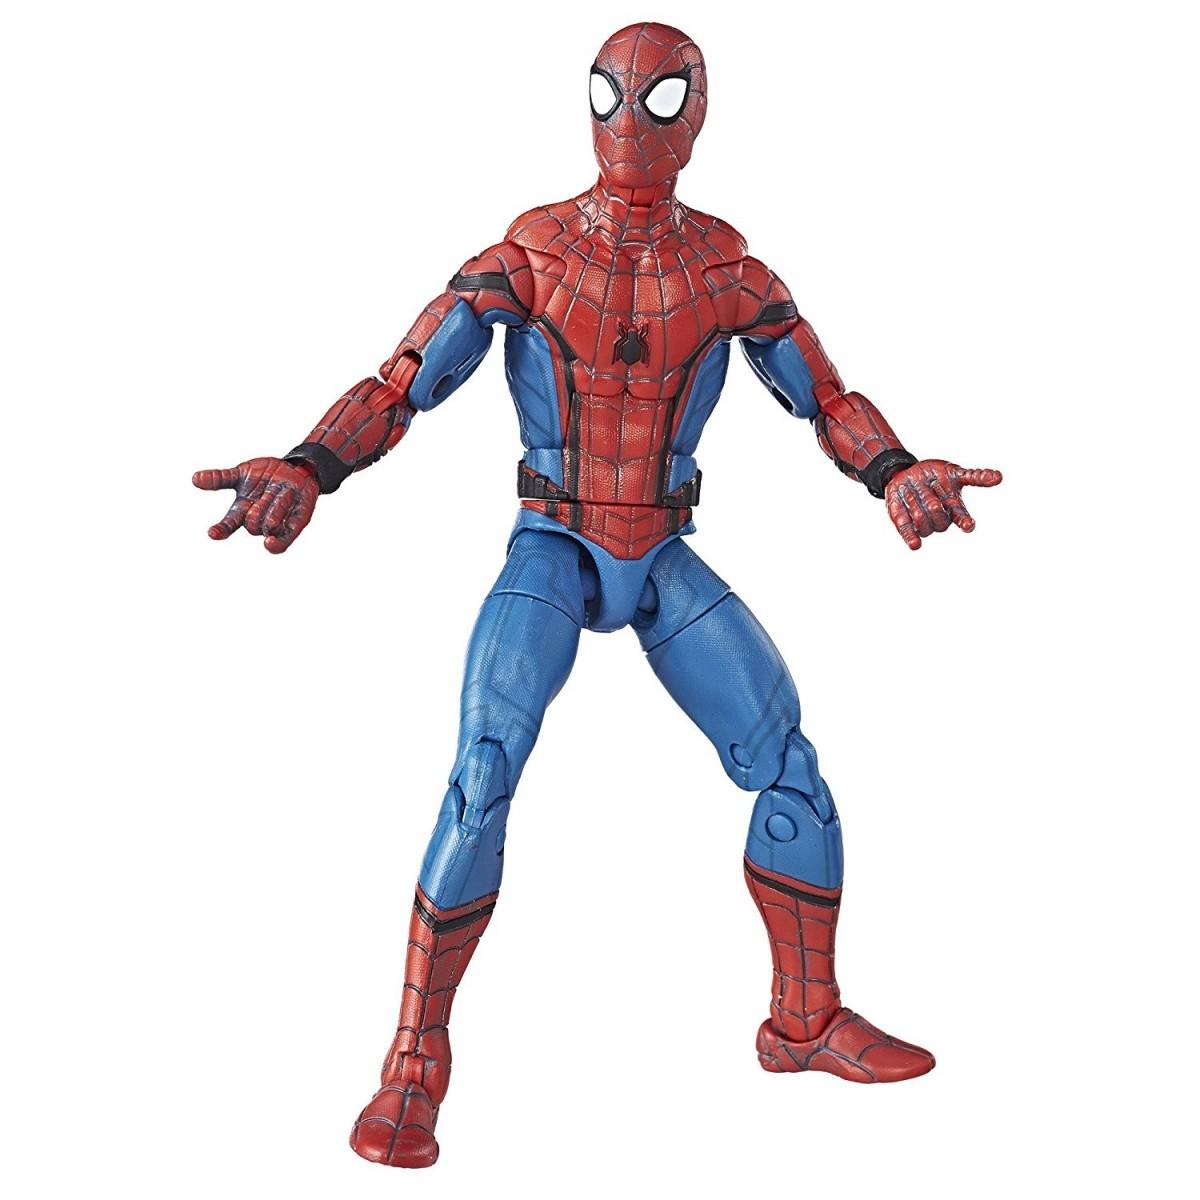 Homem-Aranha De Volta ao Lar (Spider-Man Homecoming) Marvel Legends - Hasbro